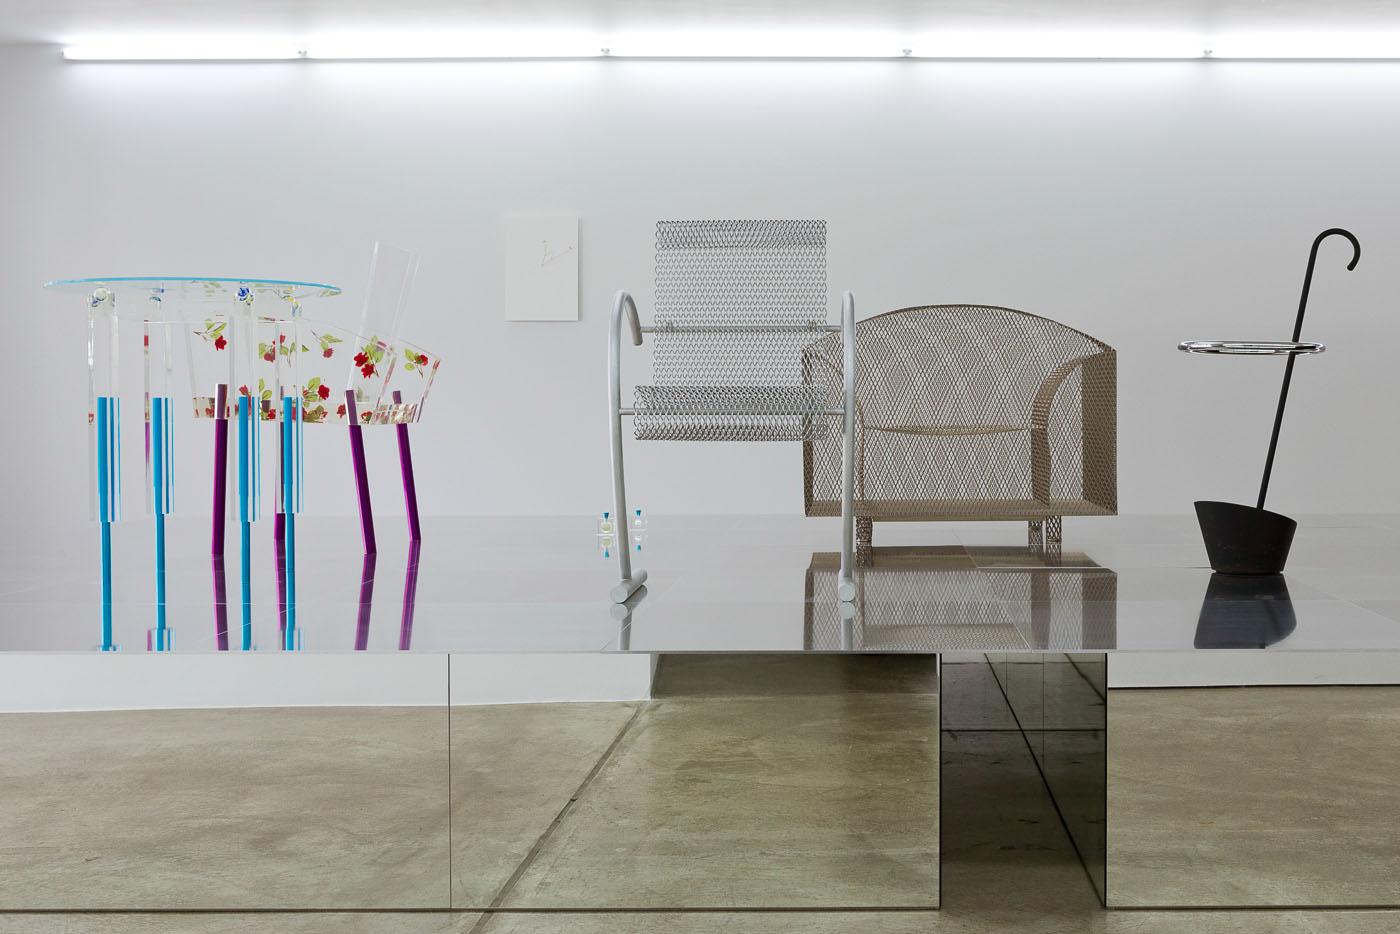 vitra design museum_kuramata_david saik architekt_1400x1000